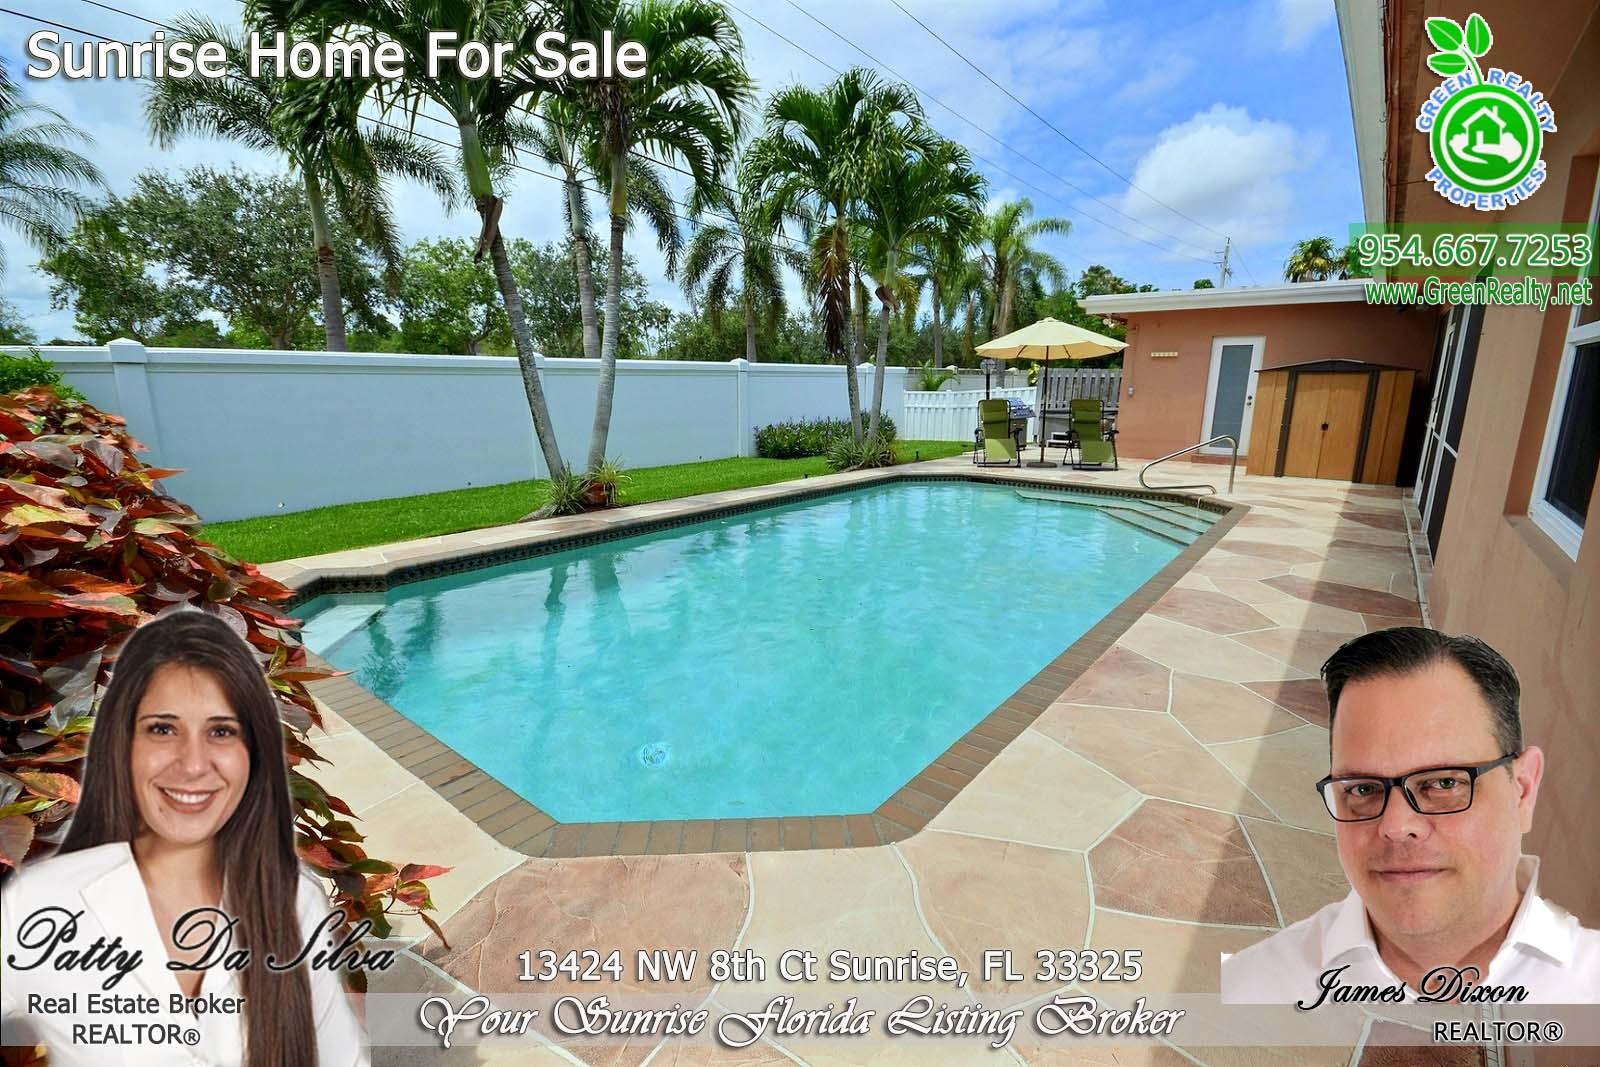 28 Sunrise Florida Homes For Sale (3)